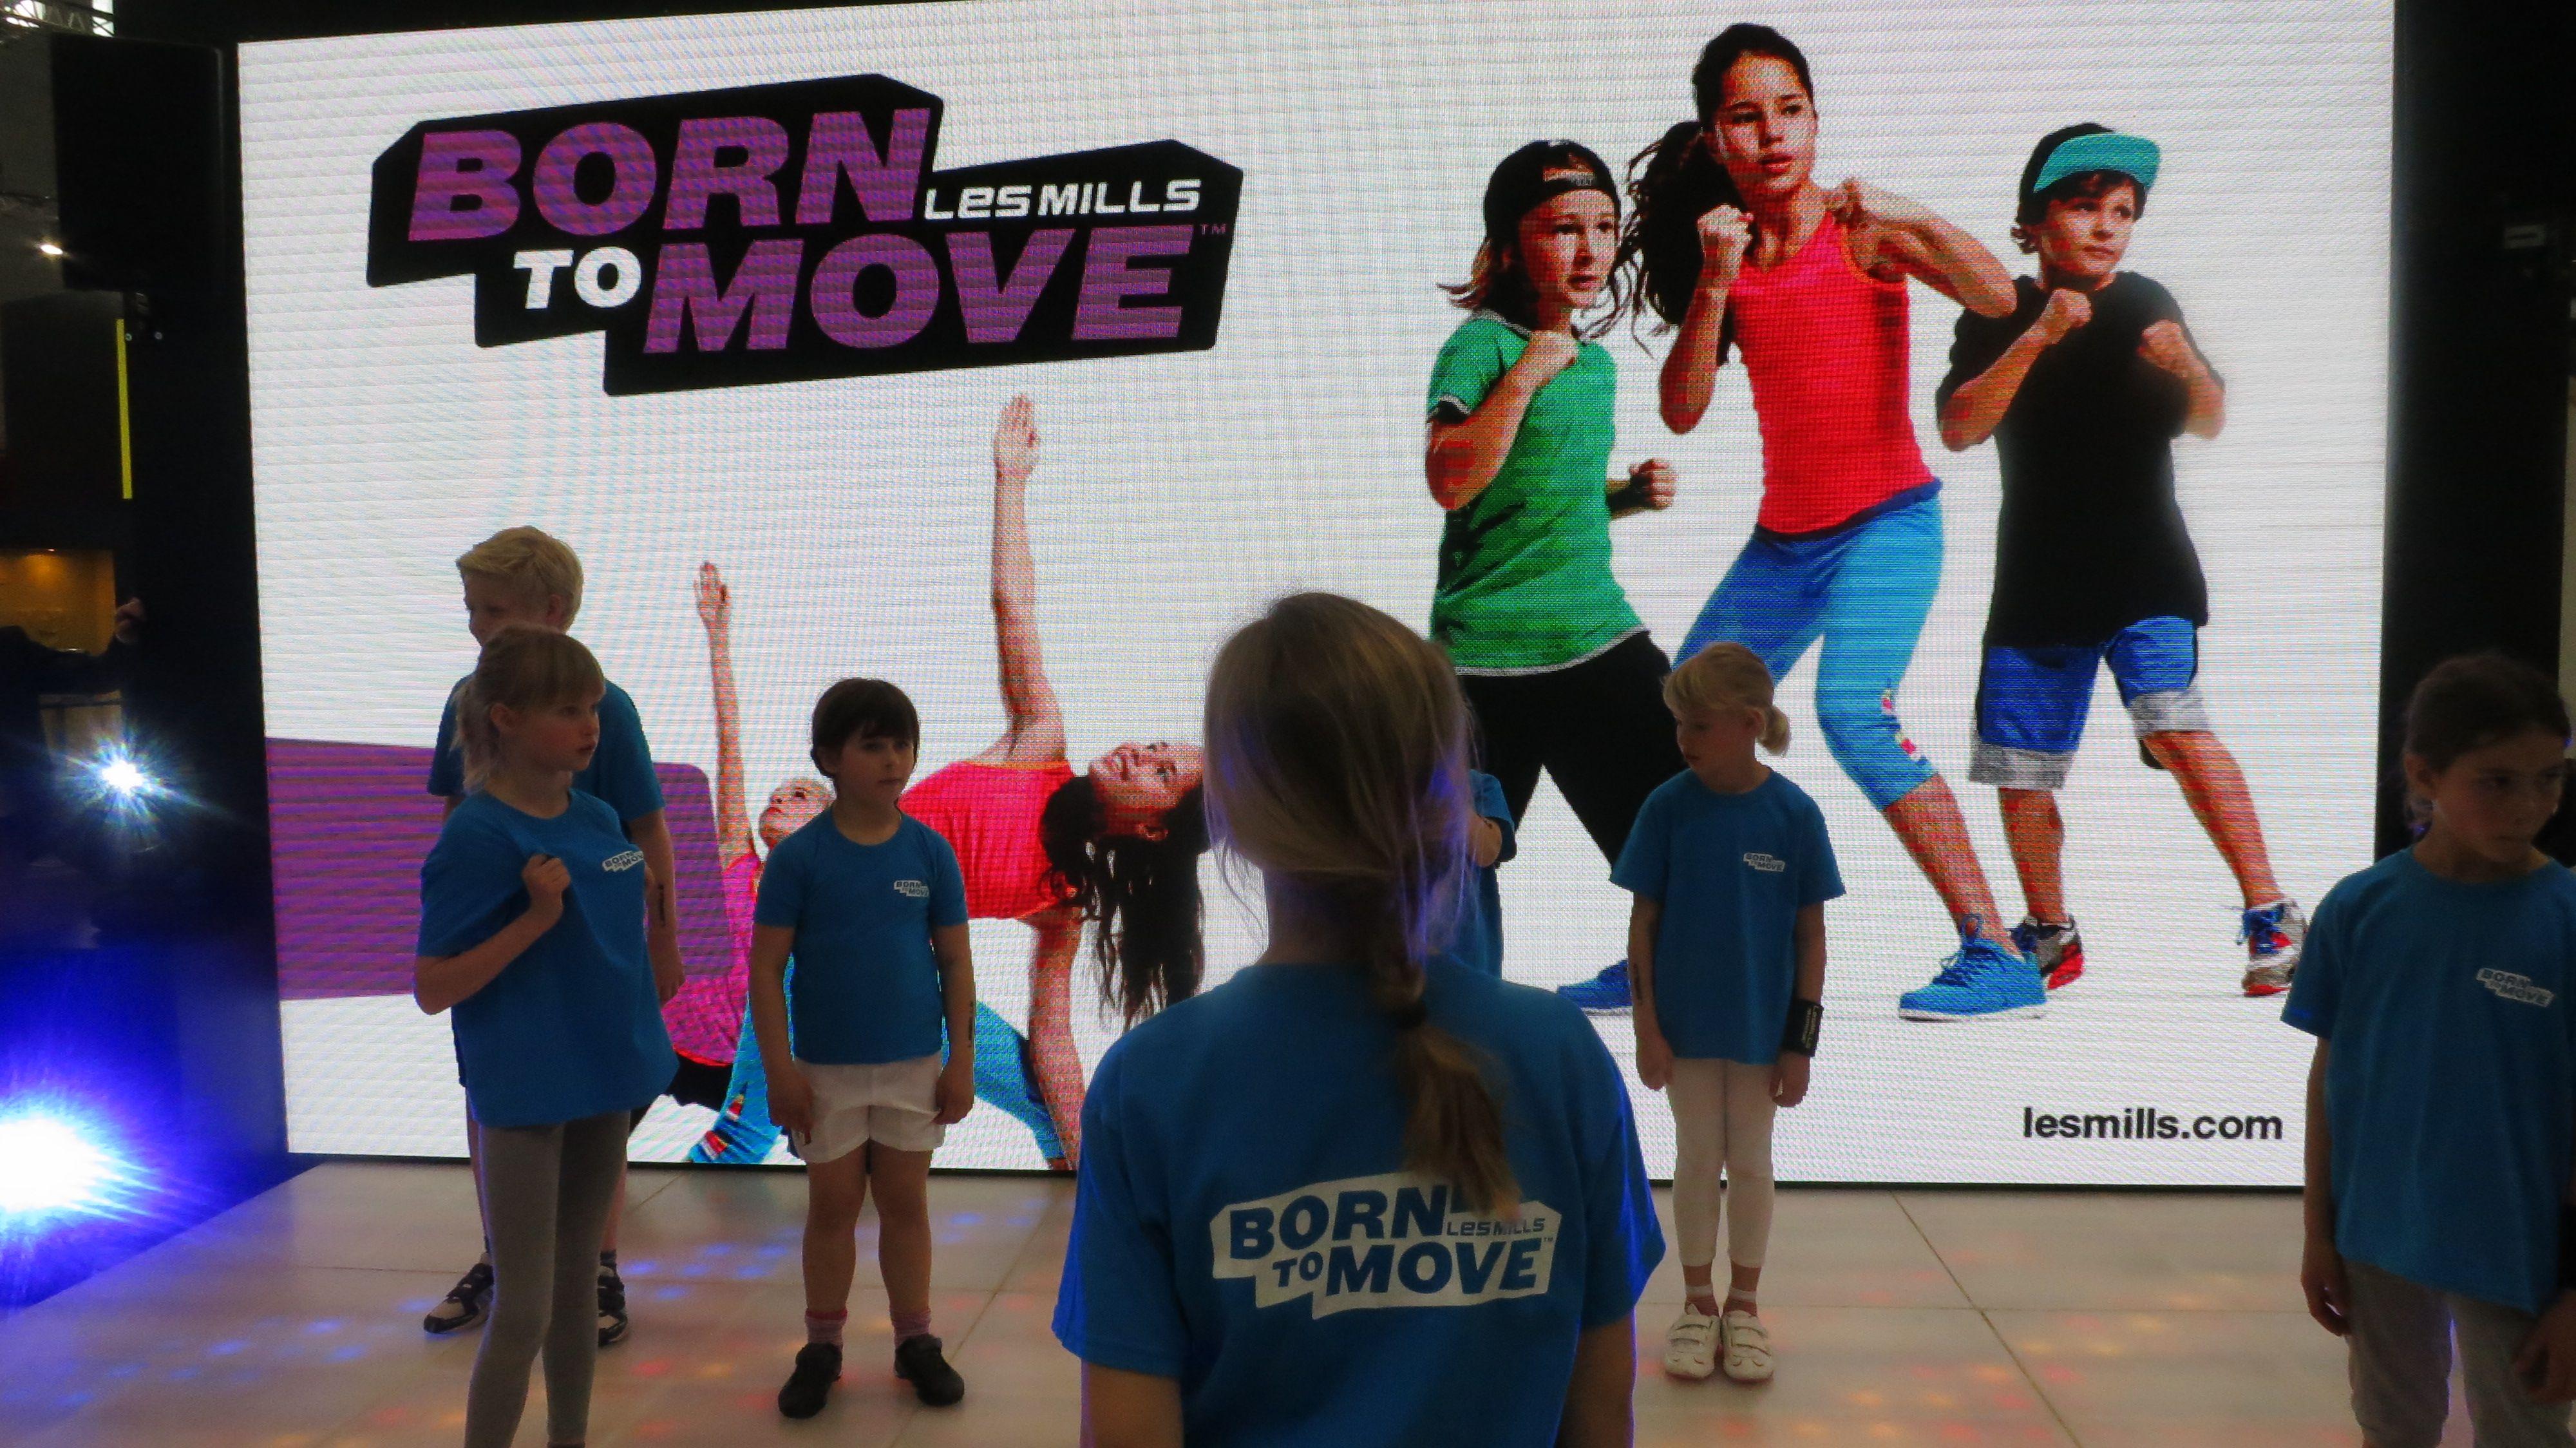 #fibo2014 #colonia #fitness #viaggi #egowellness #child #workout #outdoor